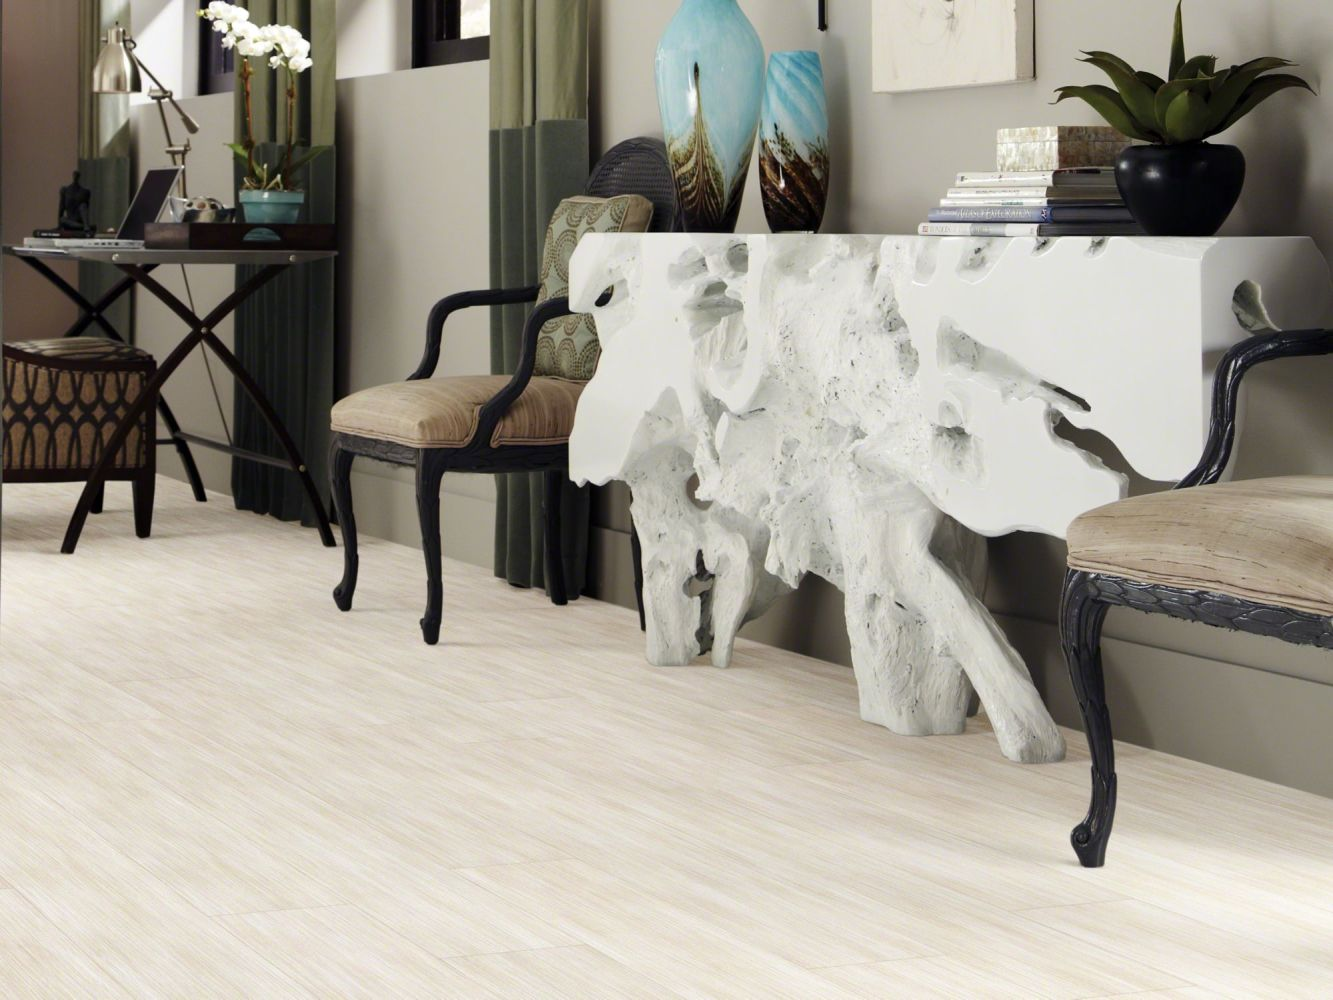 Shaw Floors Nfa HS Society 20 Bistro 00271_VH519